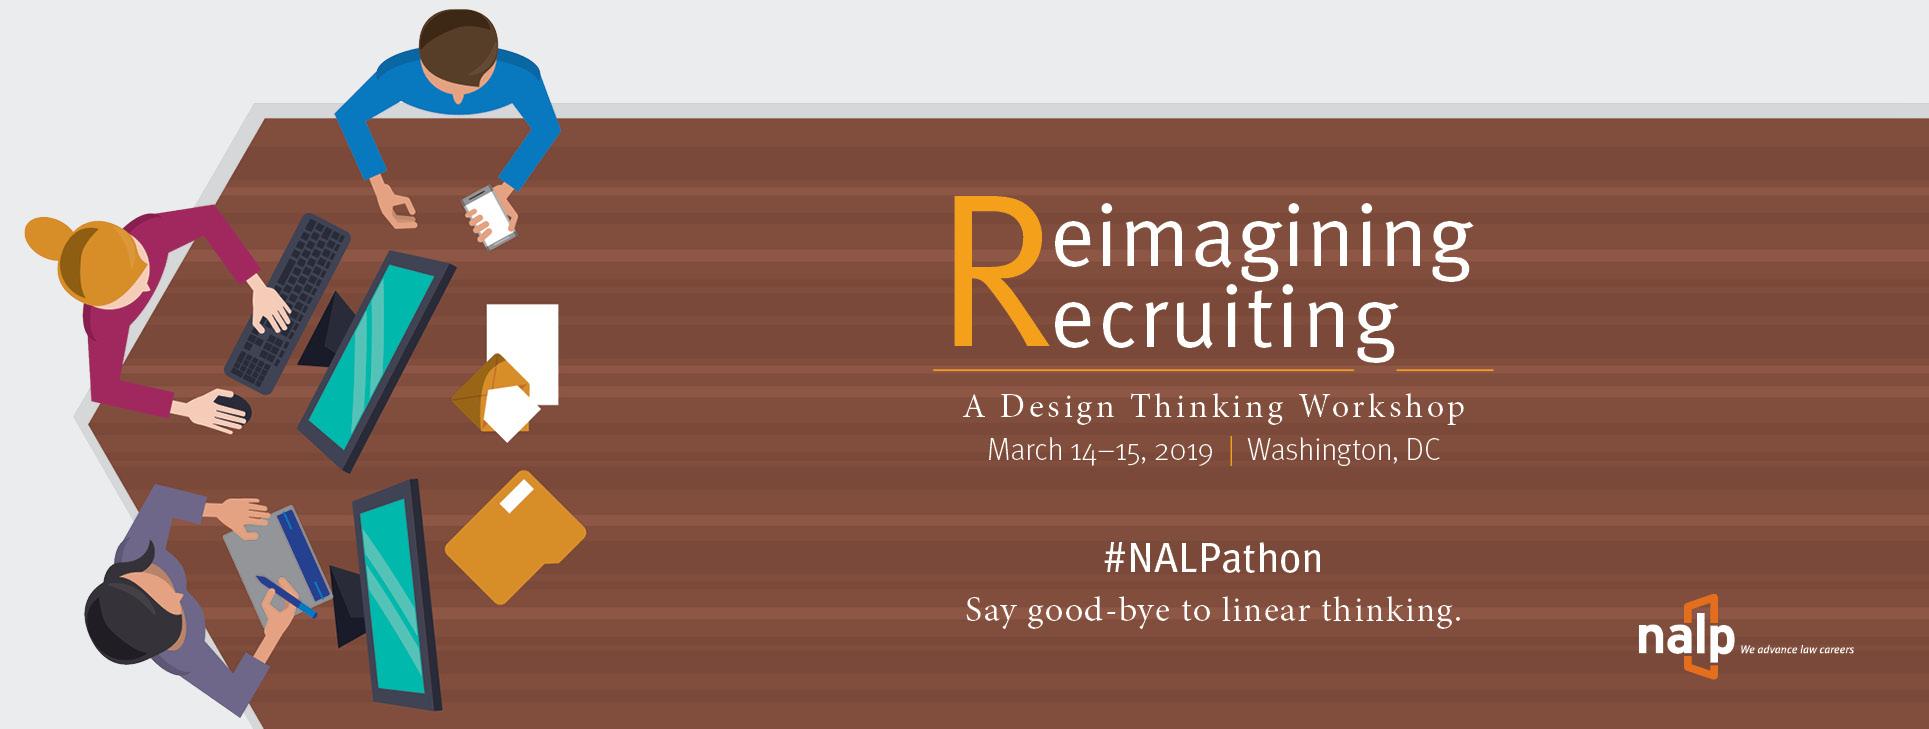 Reimagining Recruiting: A Design Thinking Workshop